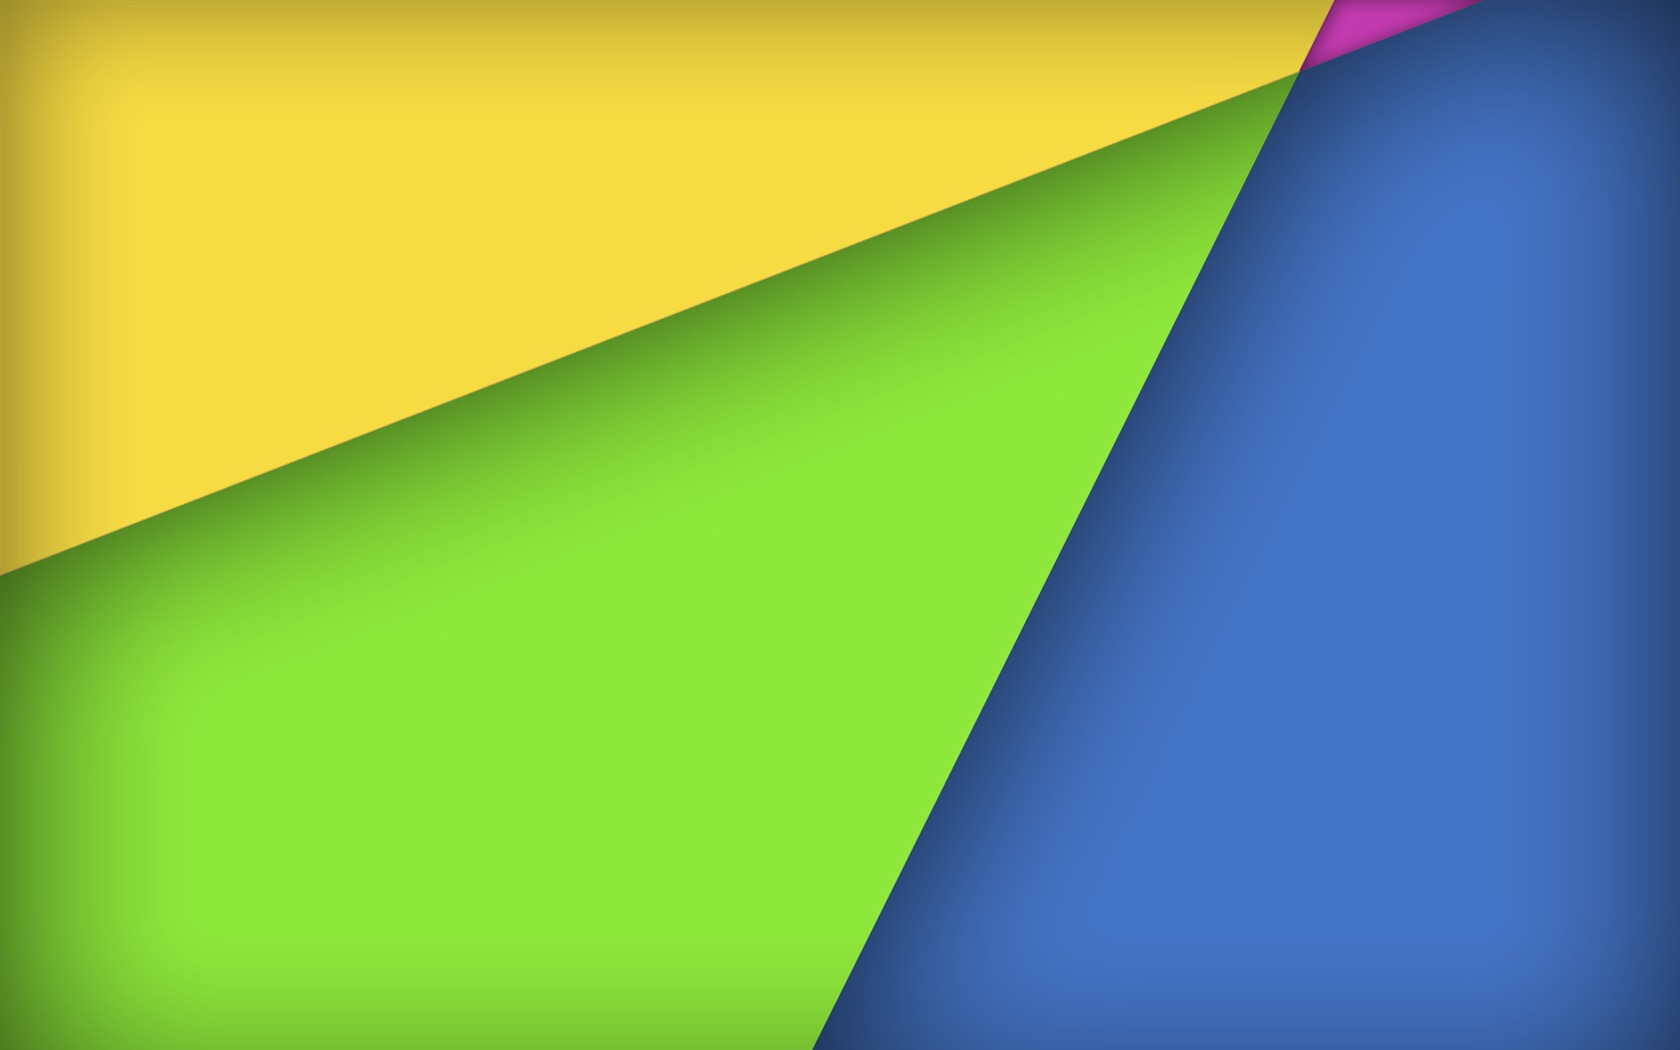 Tablet PC HD Desktop Wallpaper 02   1680x1050 wallpaper download 1680x1050